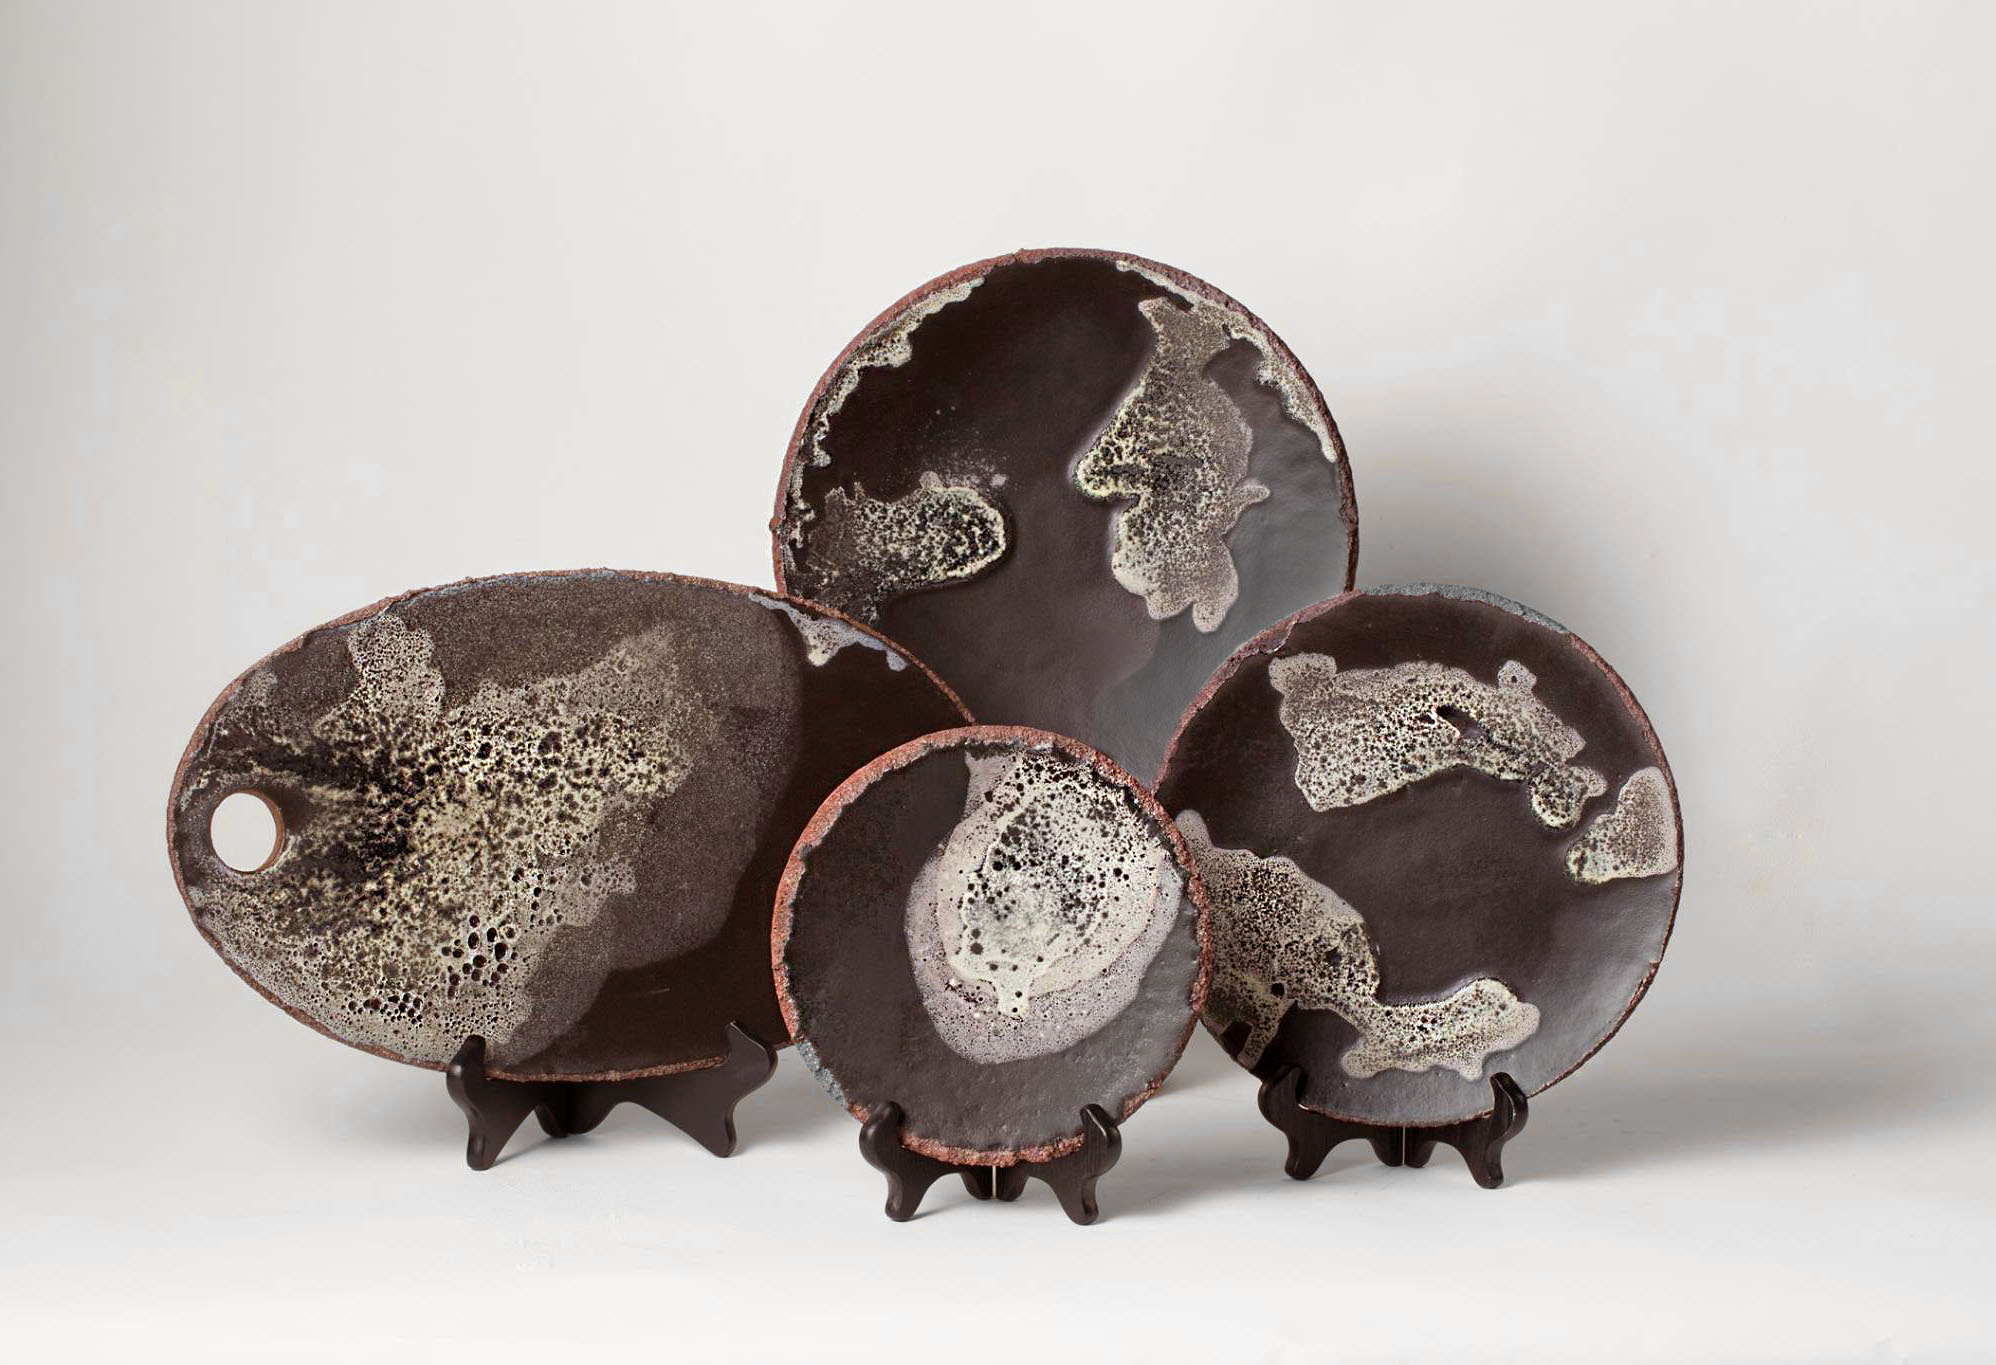 Plate/Platter Grouping